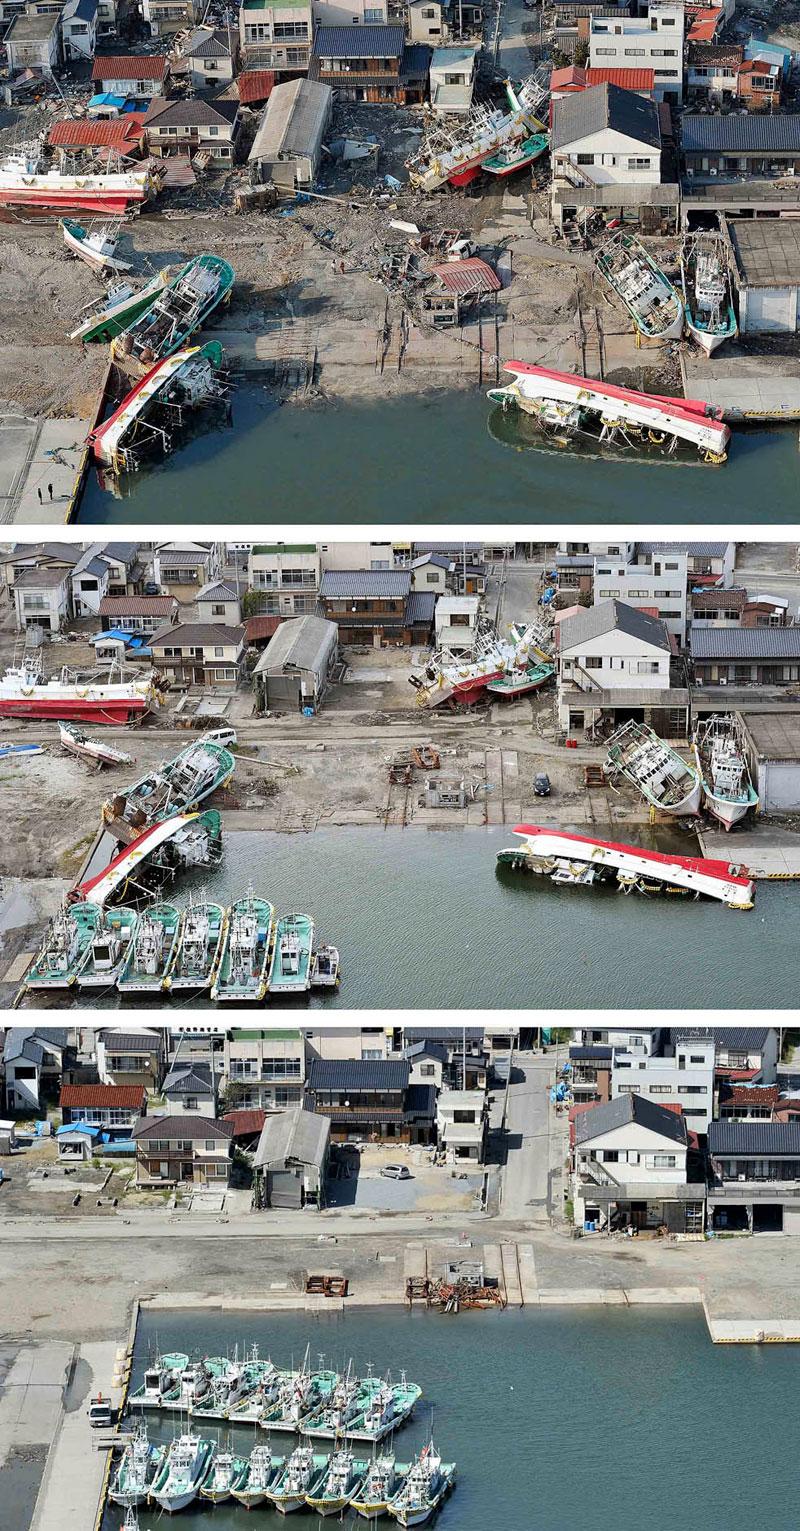 http://www.coucoucircus.org/divers/japon/japon-seisme-10.jpg